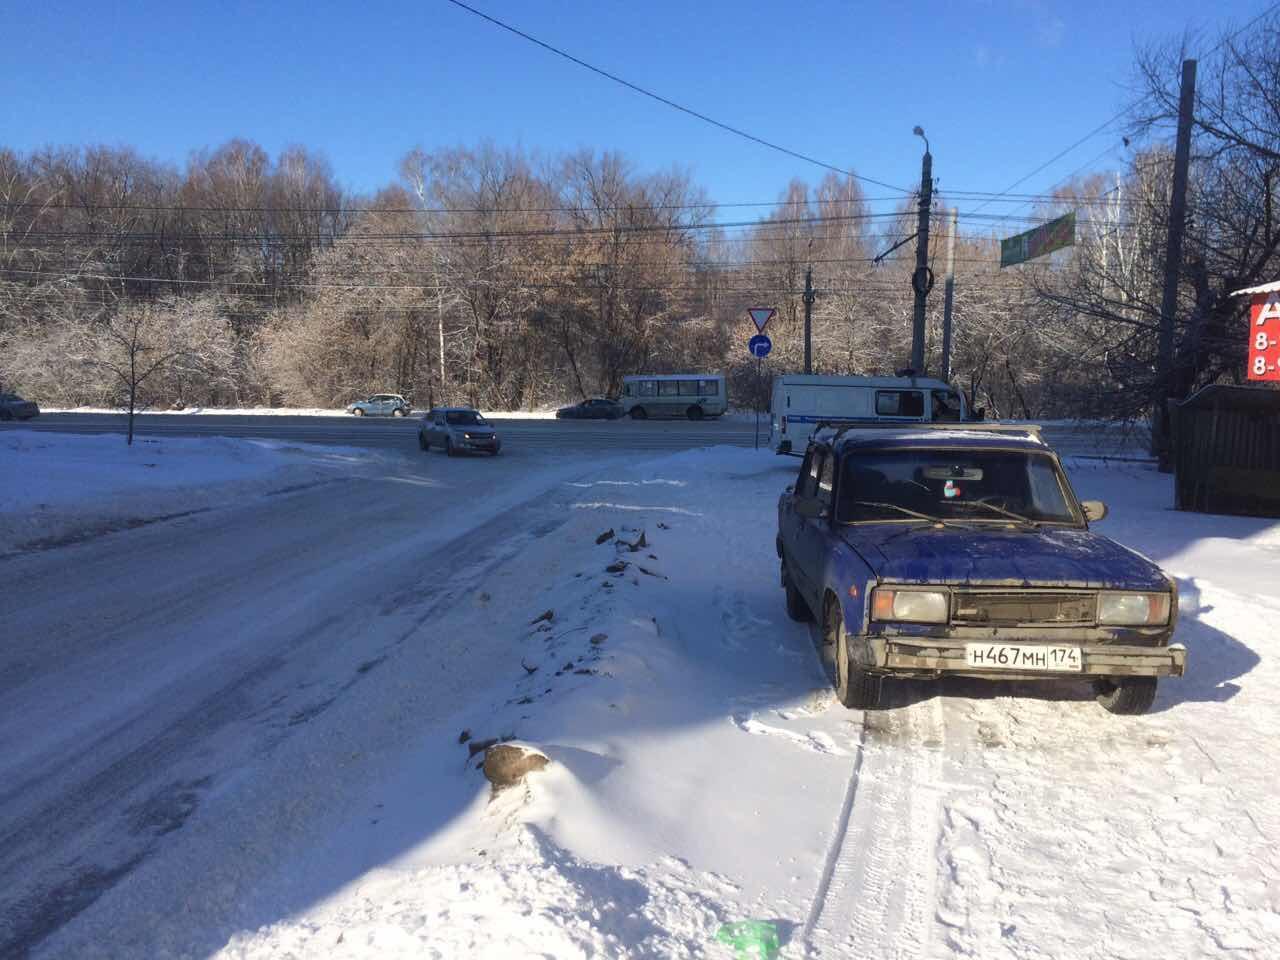 ВЧелябинске ВАЗ сбил 60-летнюю женщину натротуаре